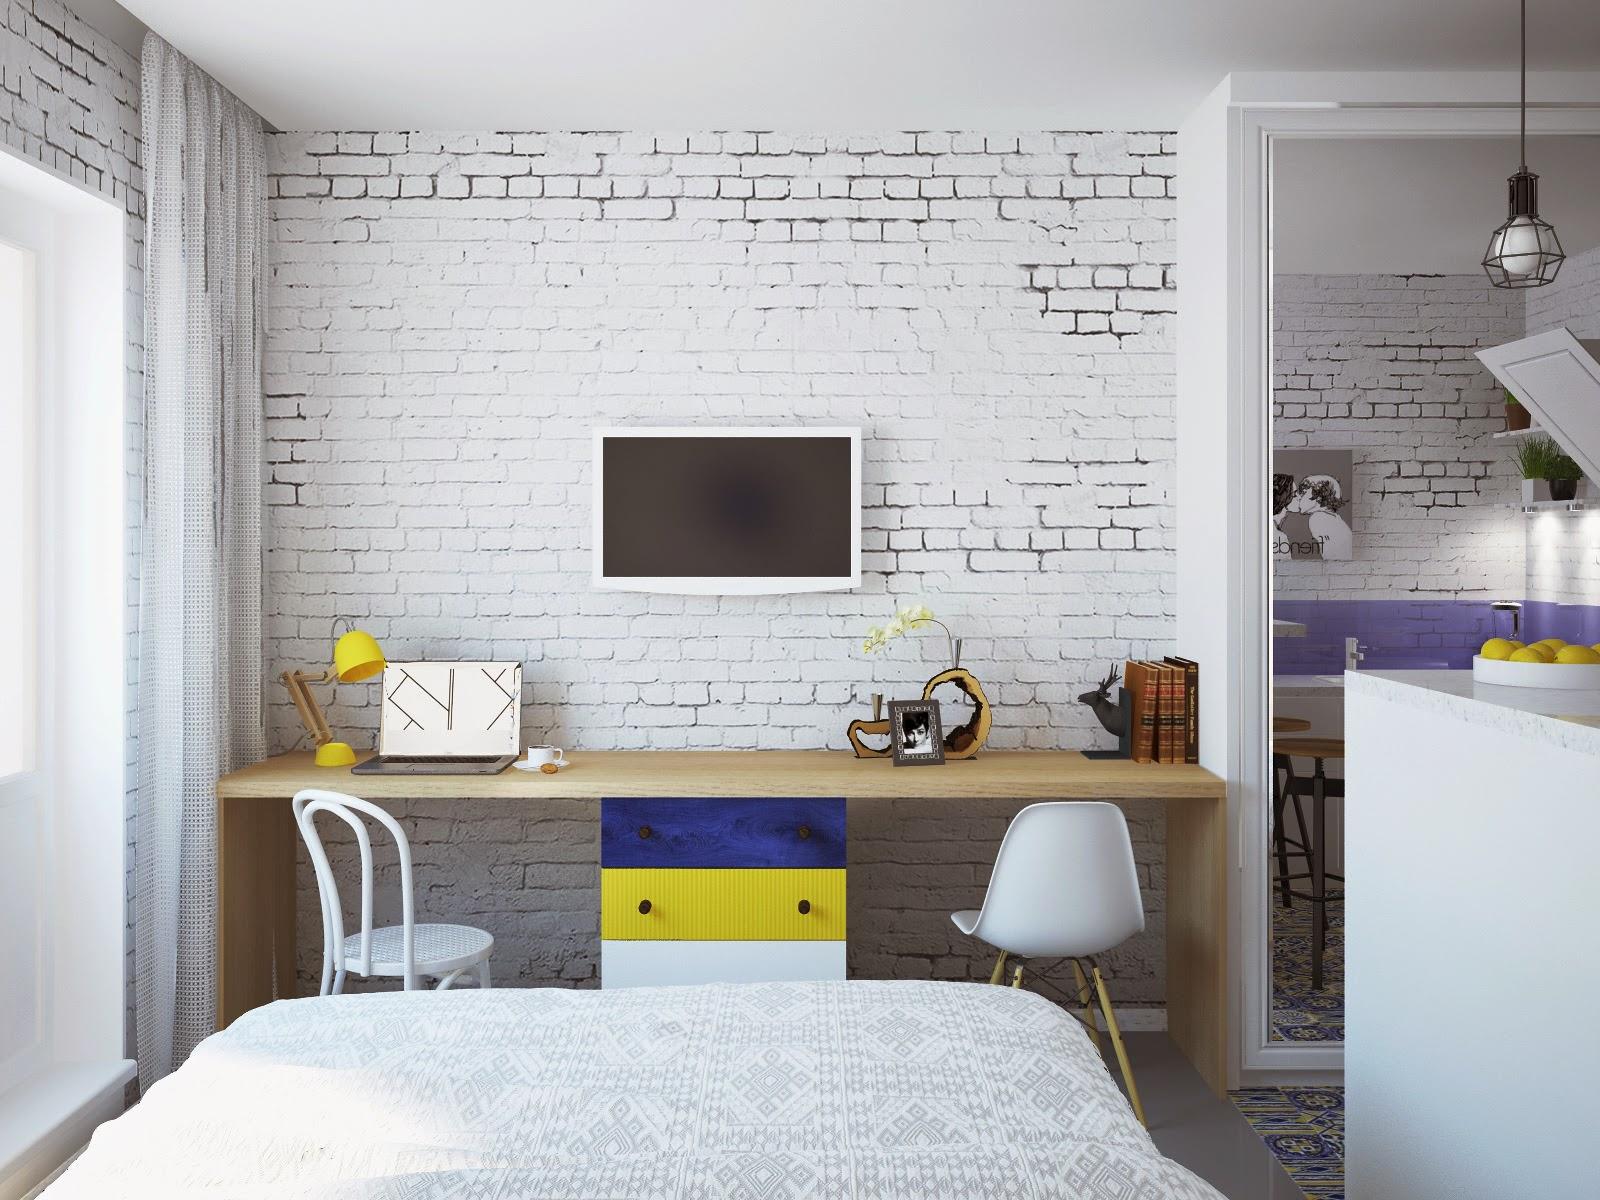 Фото дизайна квартиры студии 28 м